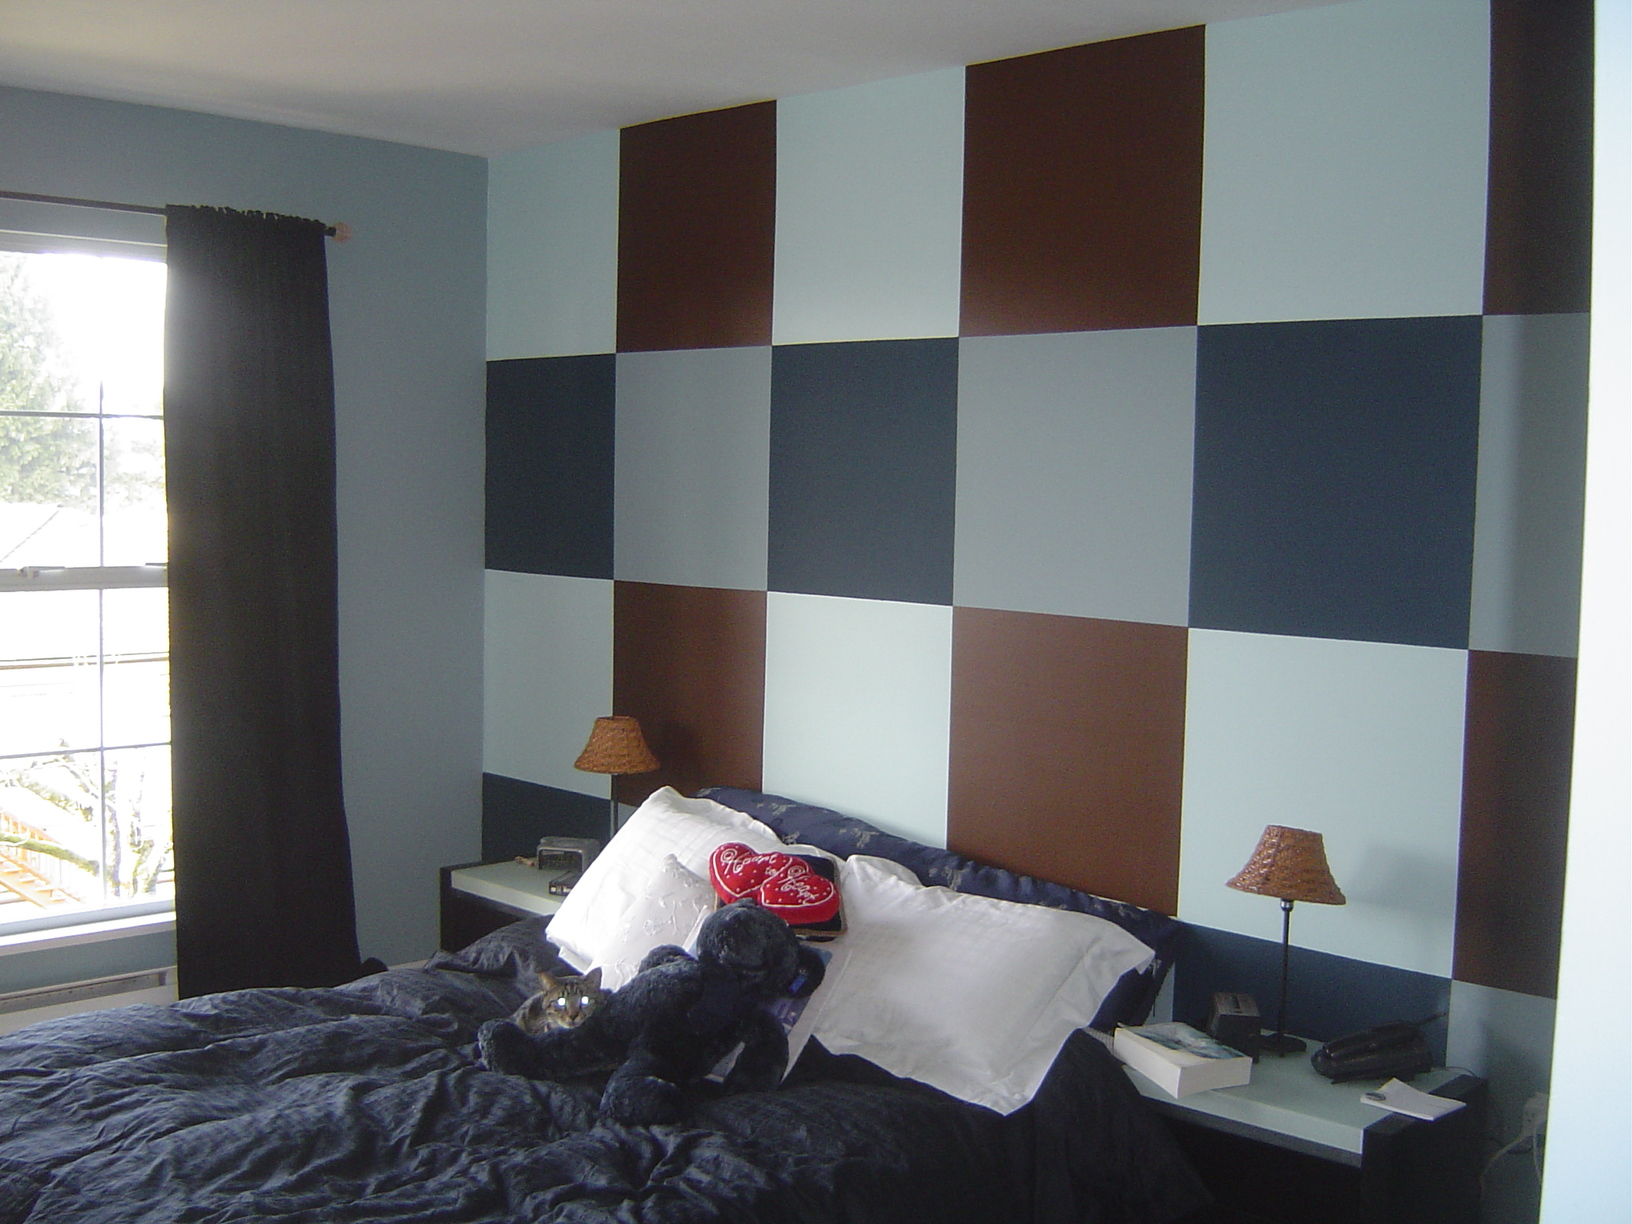 paint color schemes for bedrooms photo - 1